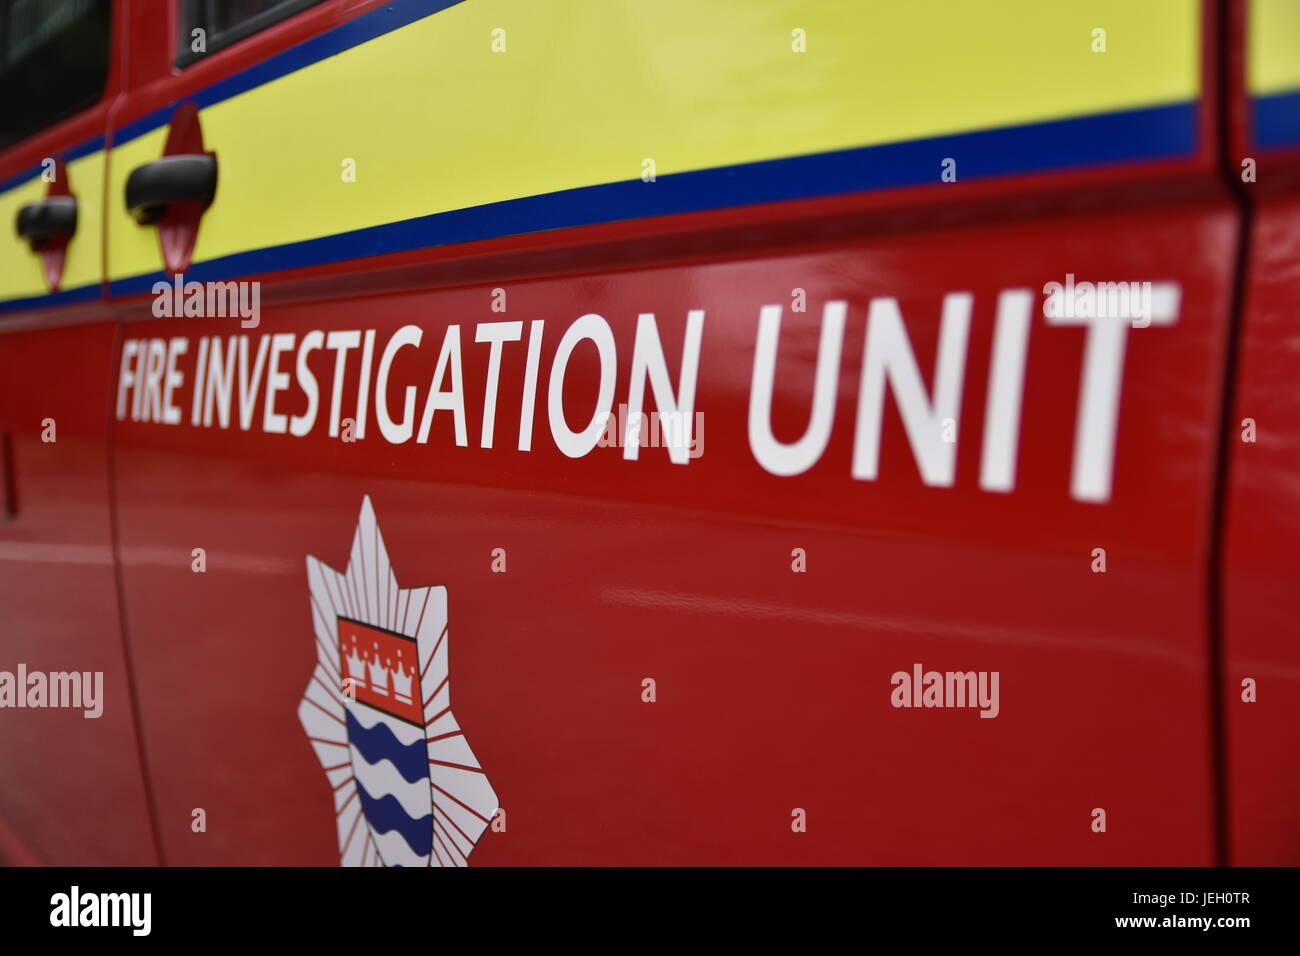 London Fire Brigade Fire Investigation Unit Van Door Text - Stock Image